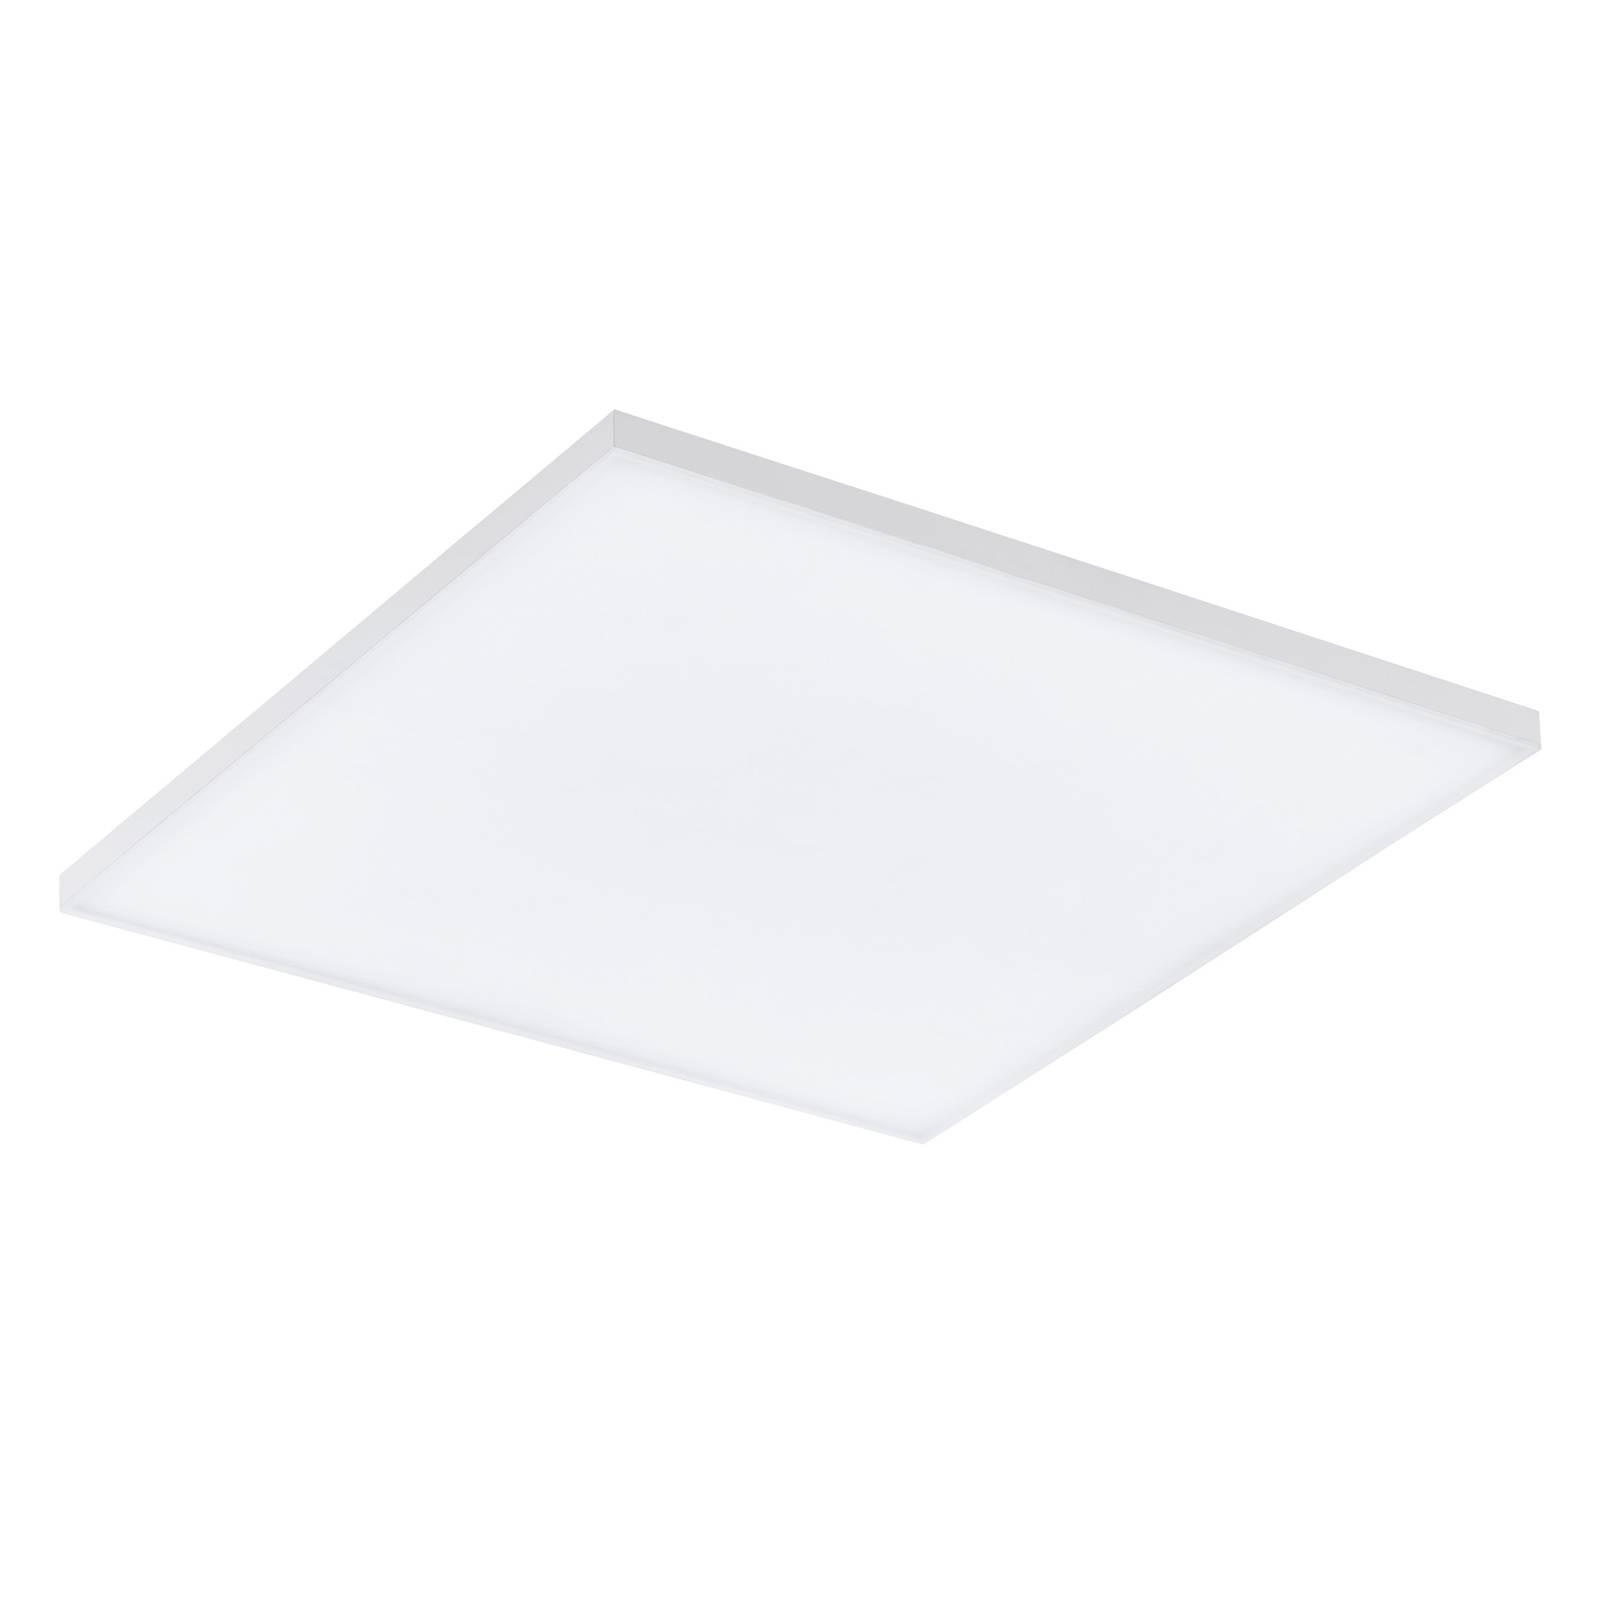 LED plafondlamp Turcona, 45 x 45 cm